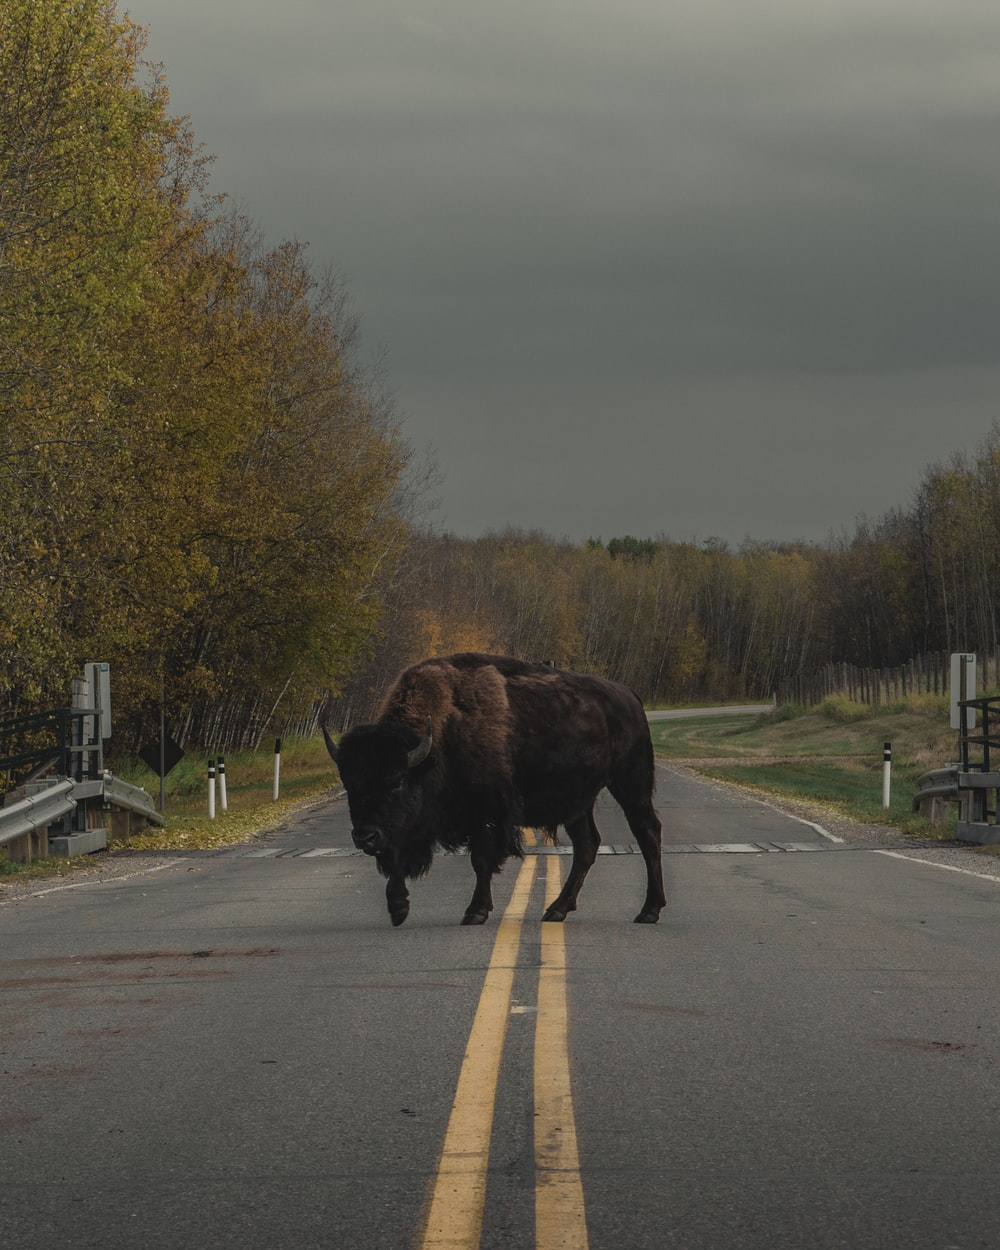 brown animal on road